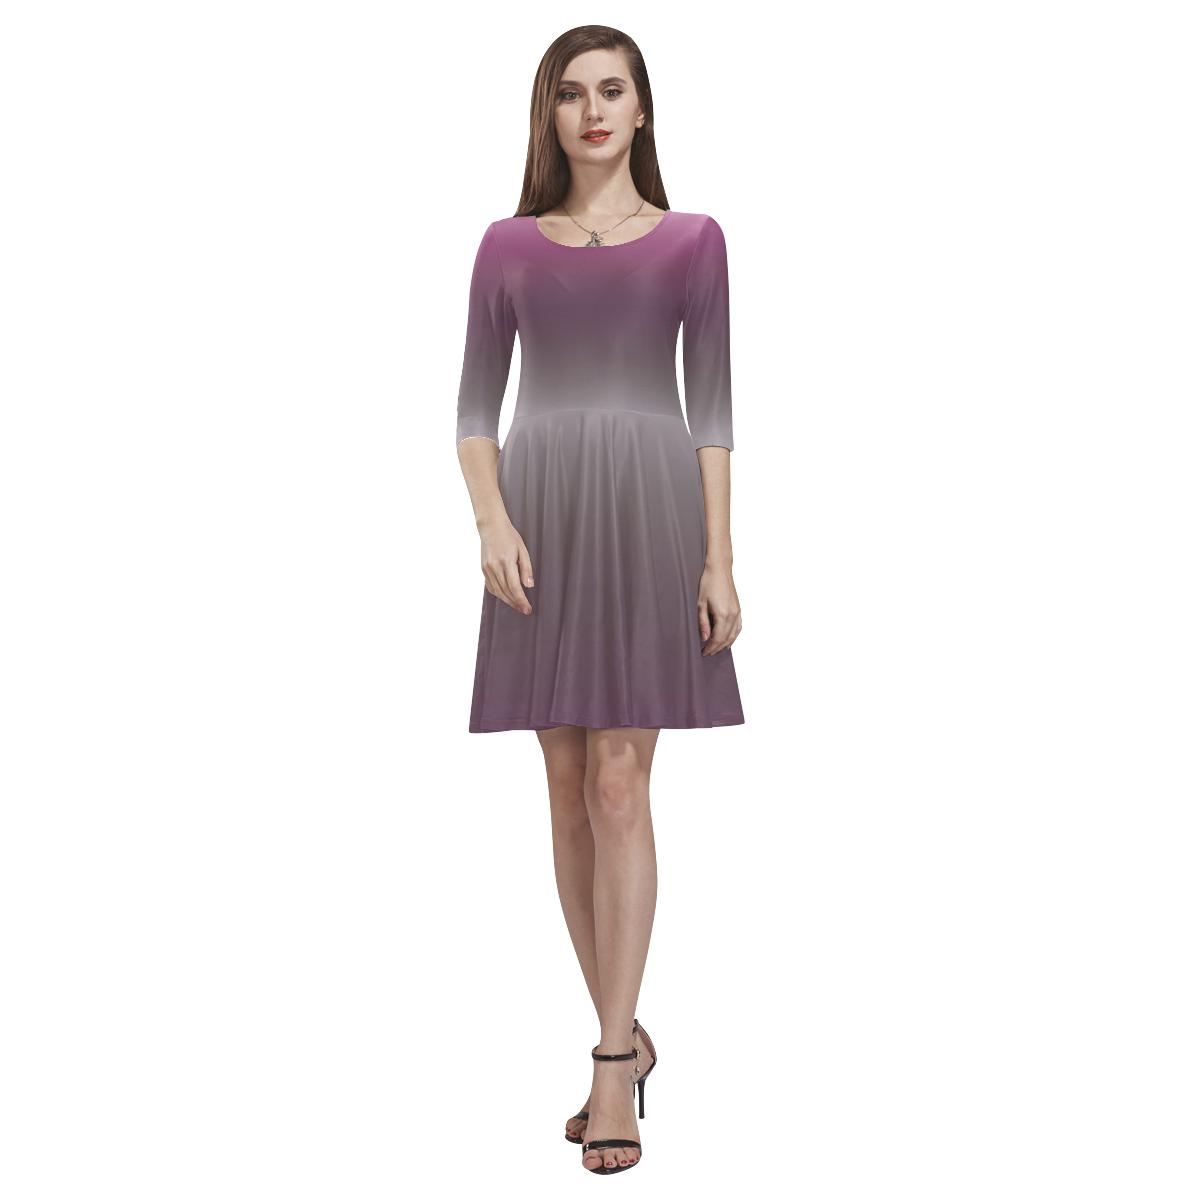 Purple Ombre Gradient Tethys Half-Sleeve Skater Dress(Model D20)